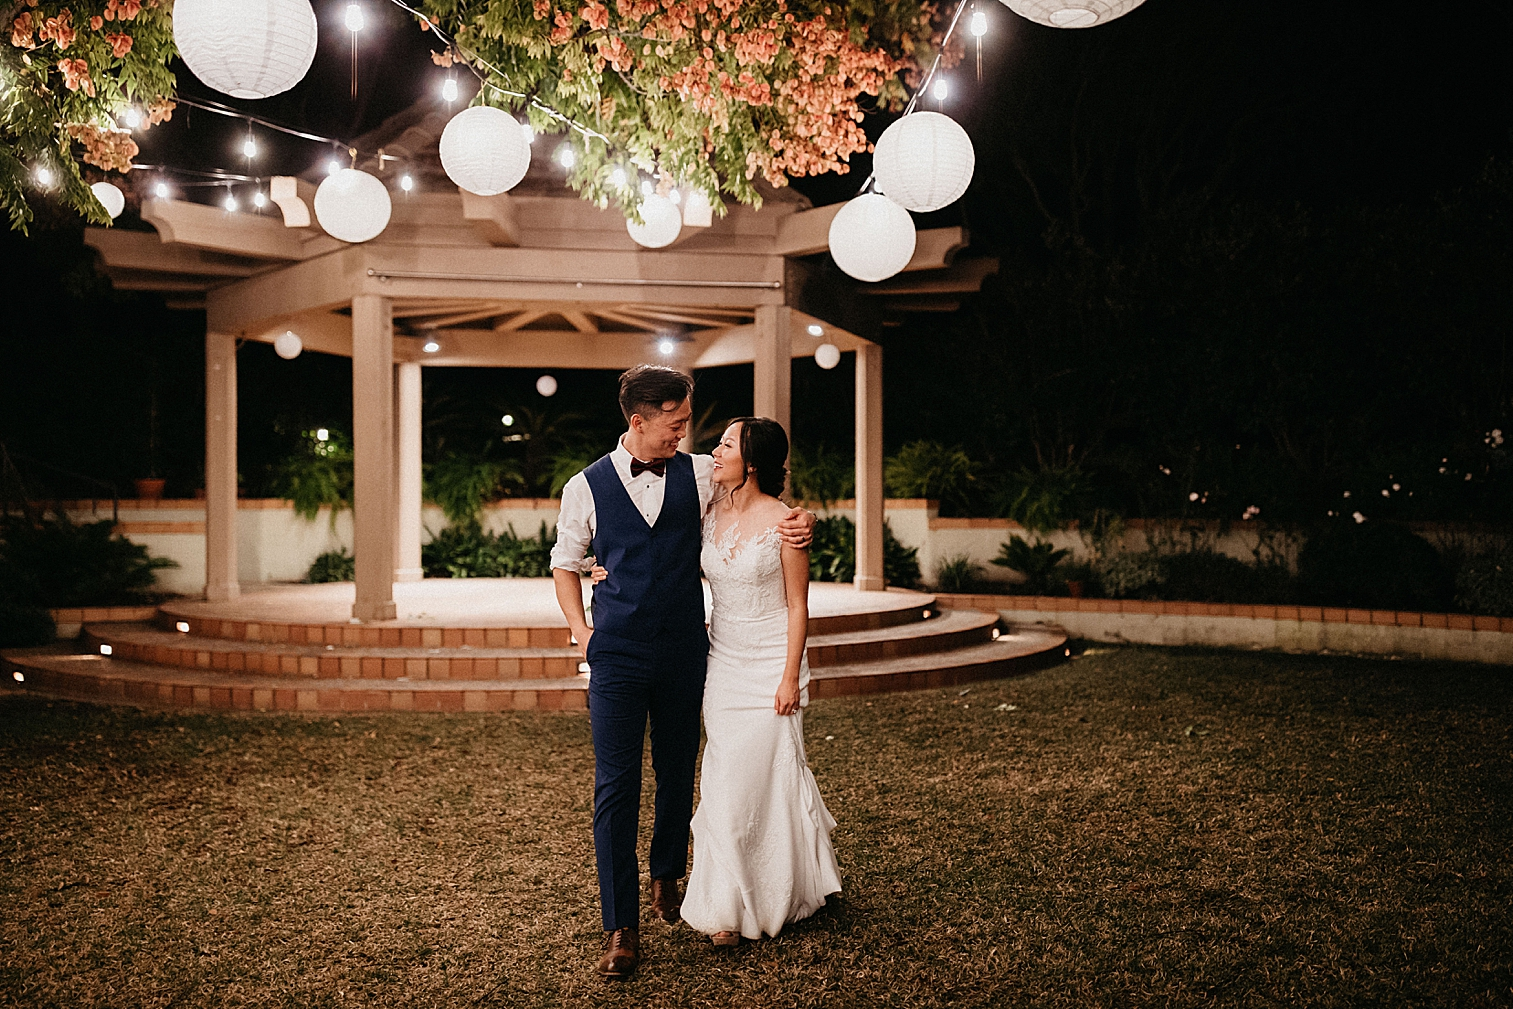 Secret-Garden-Rancho-Santa-Fe-Wedding-146.jpg